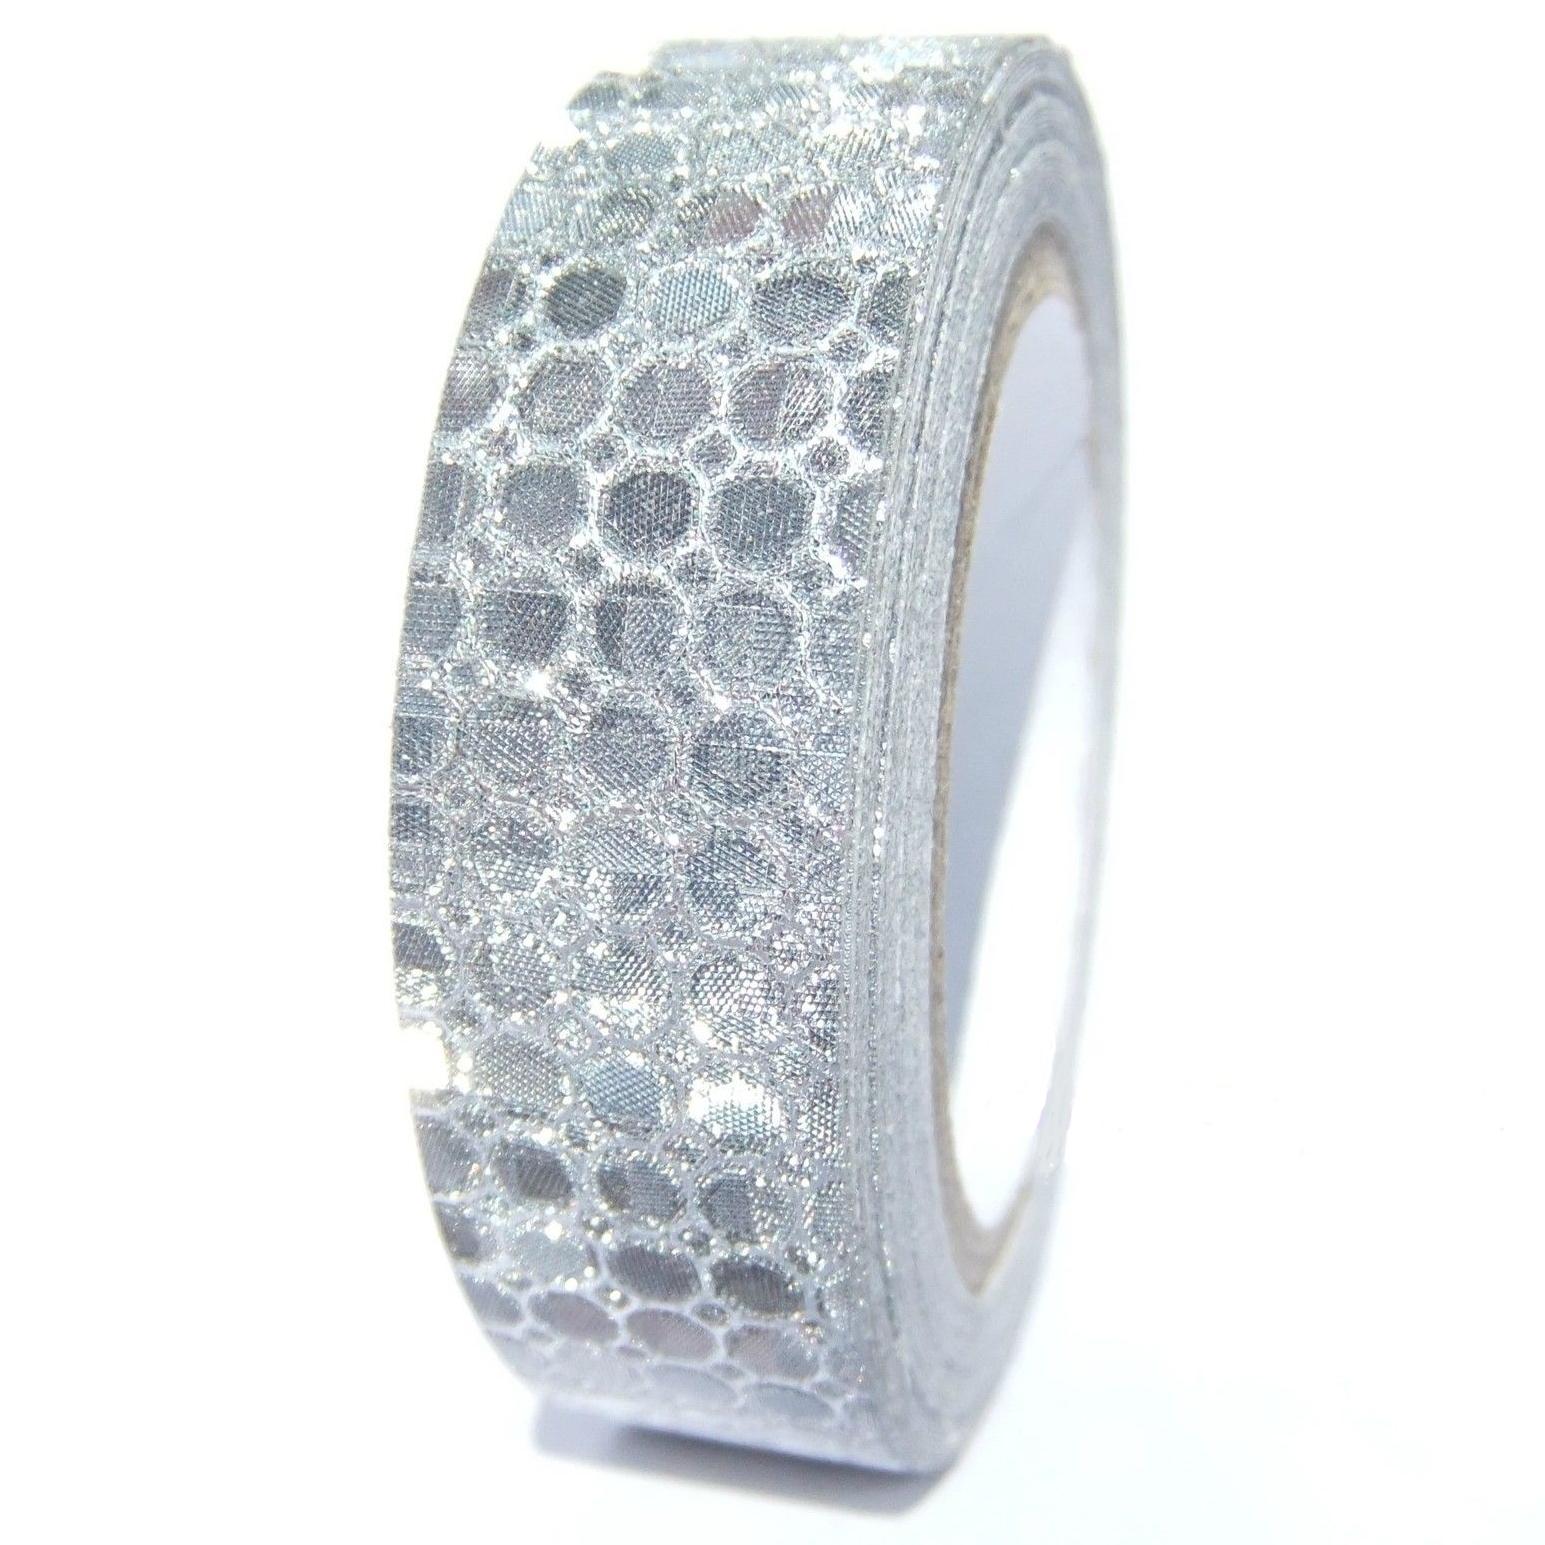 fabric tape gris argente paillette ruban tissu adhésif